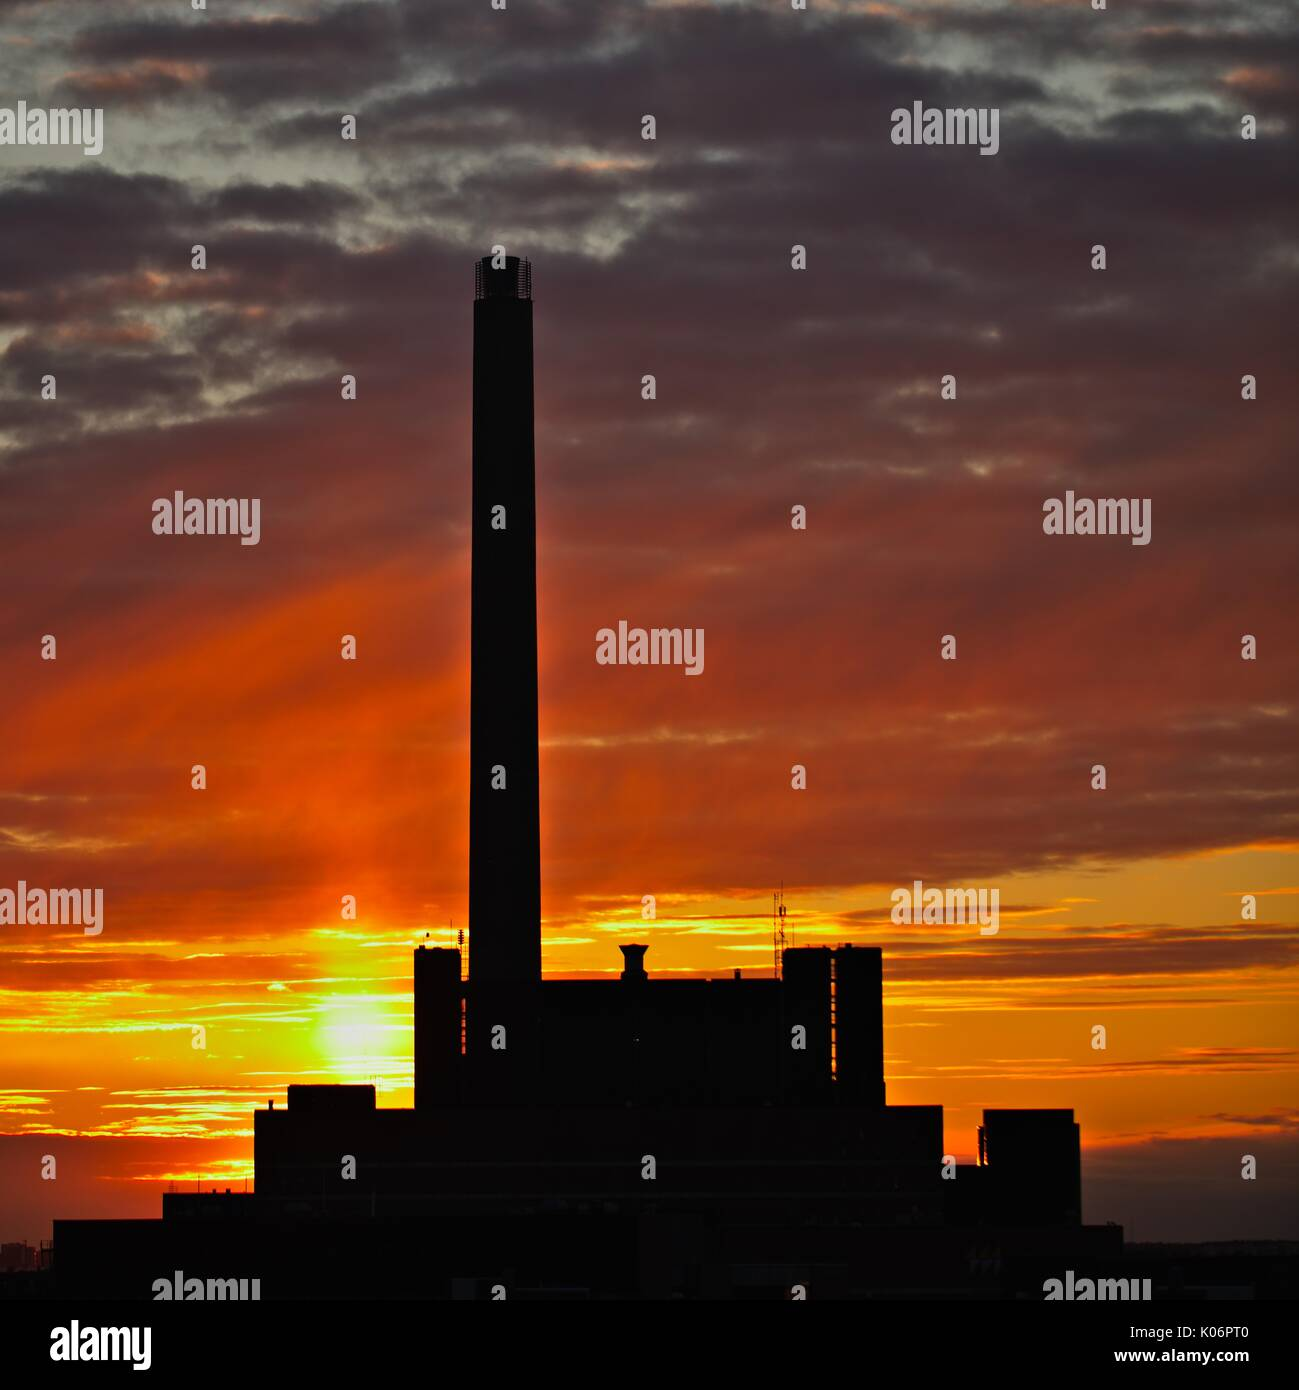 Helen Oy, Helsinki, at sunset - Stock Image